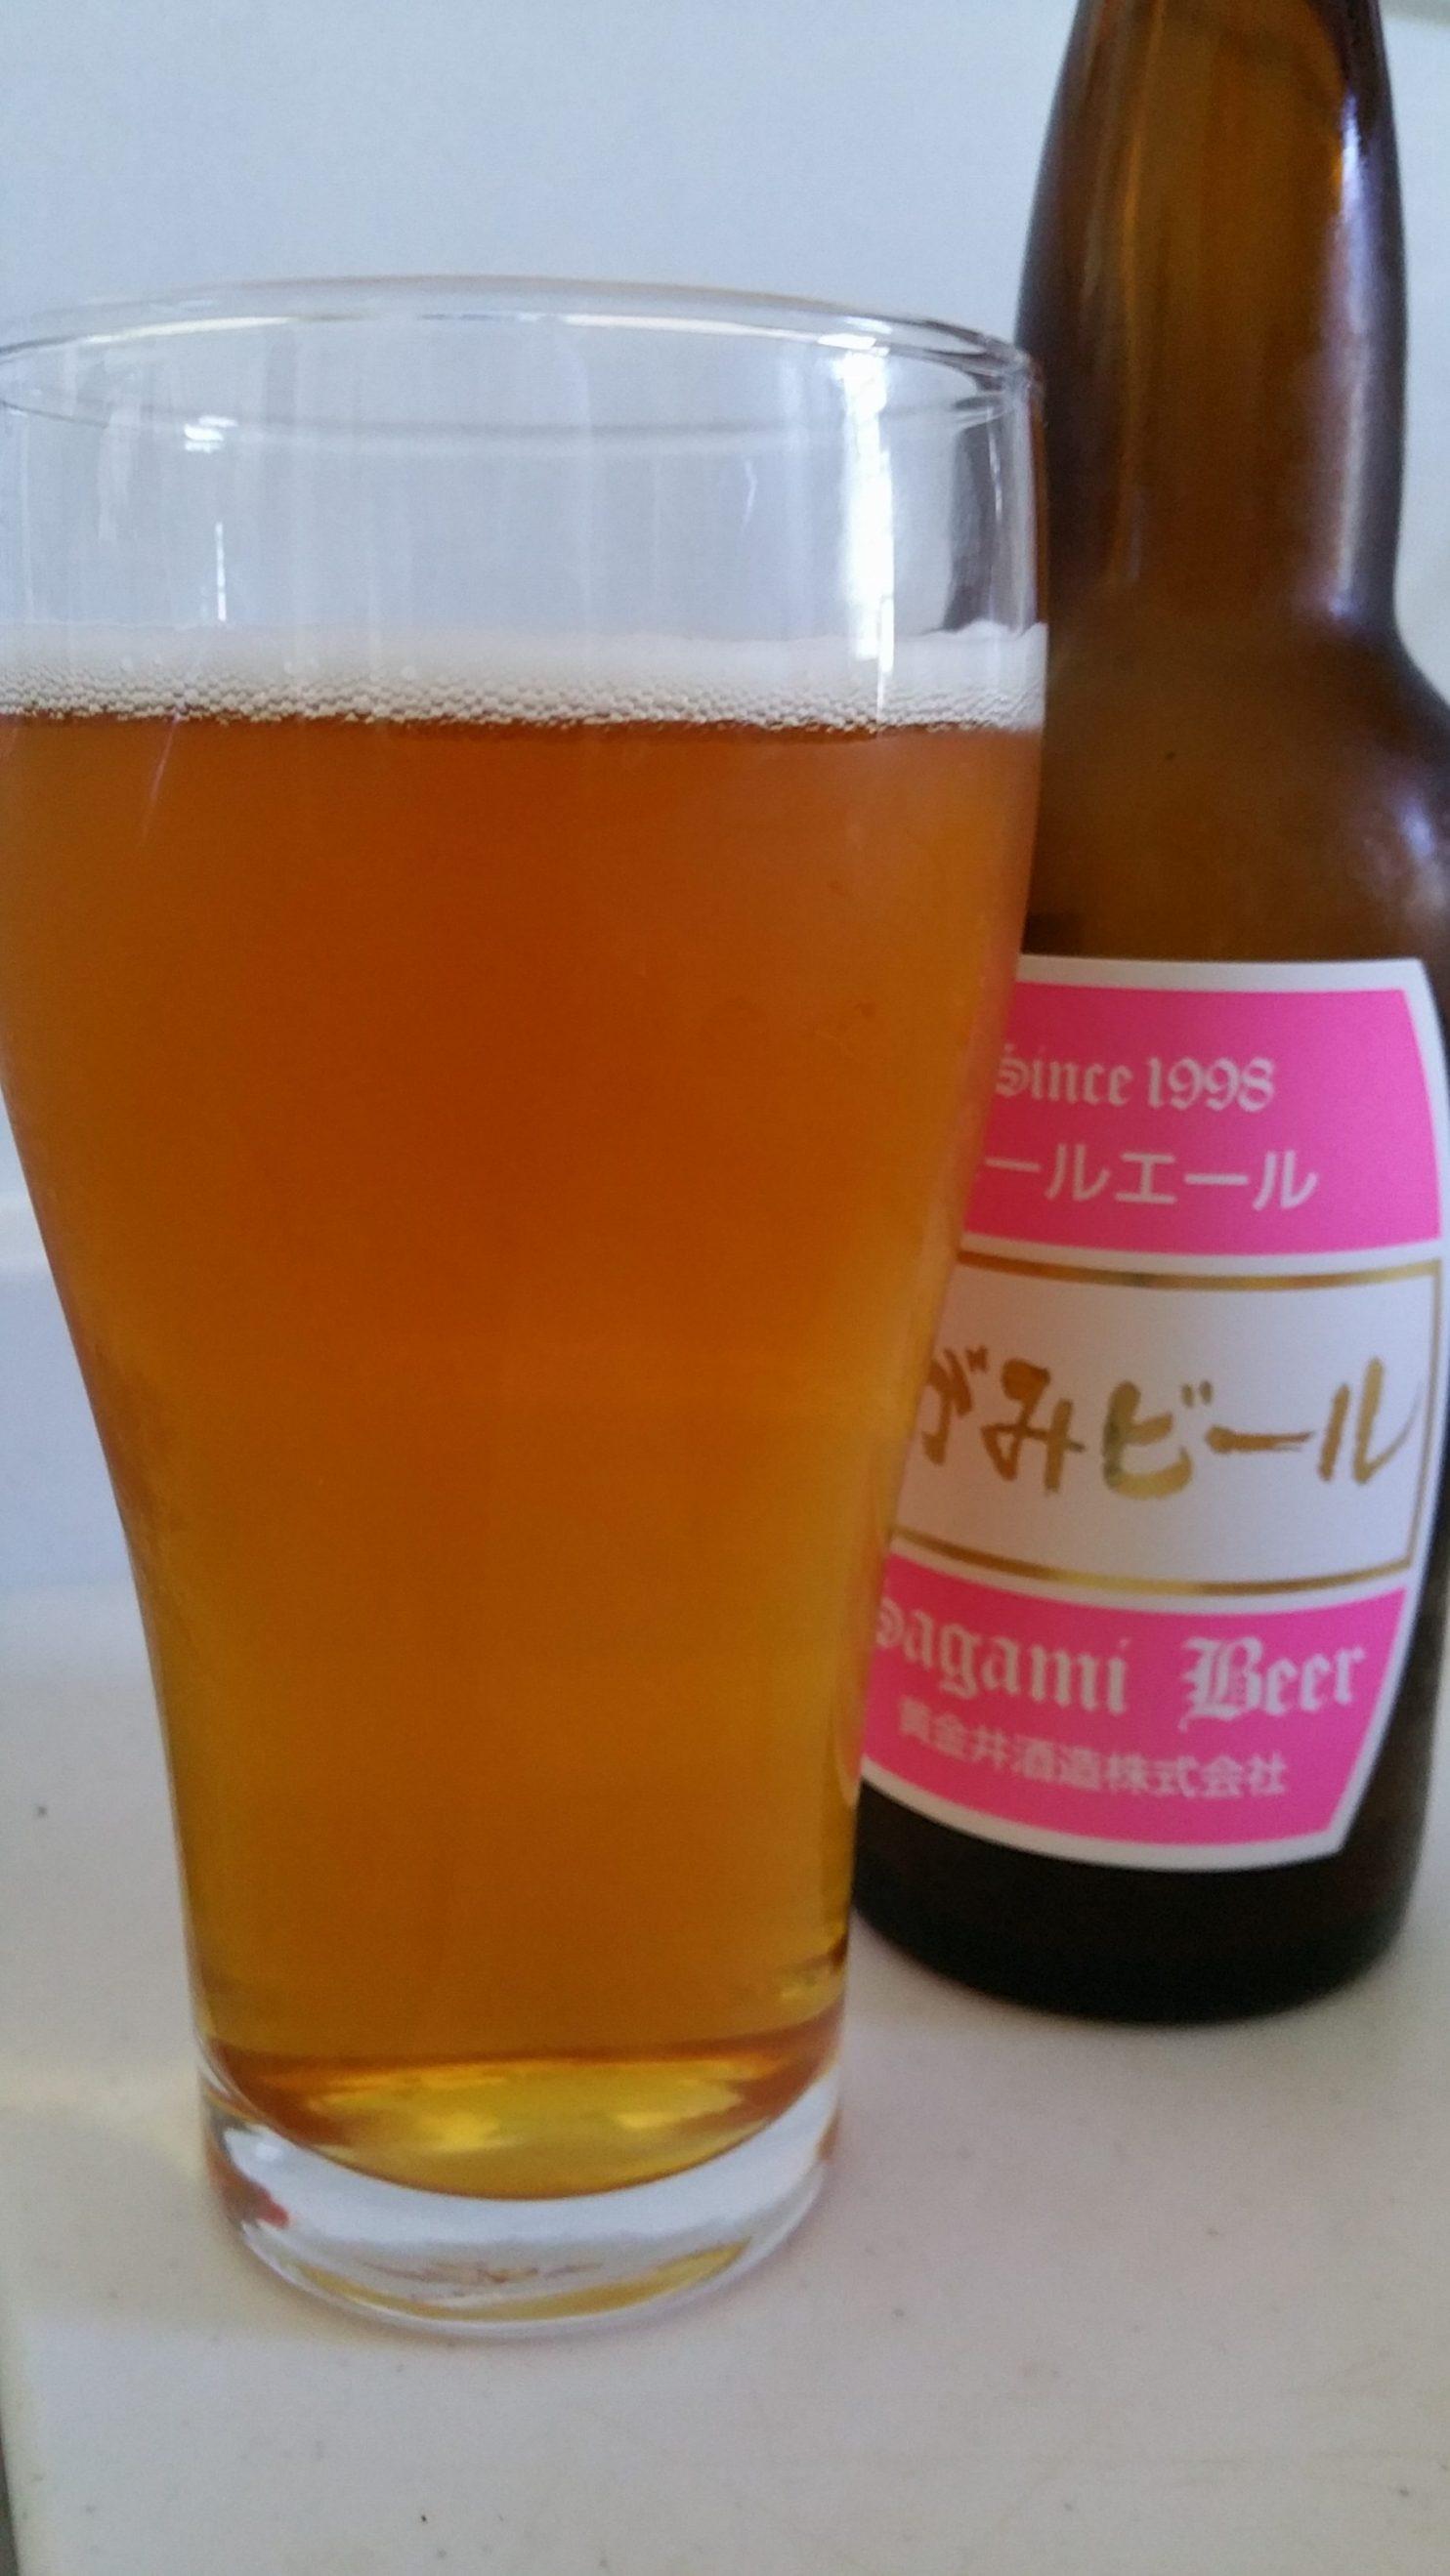 Sagami Pale Ale さがみペールエール